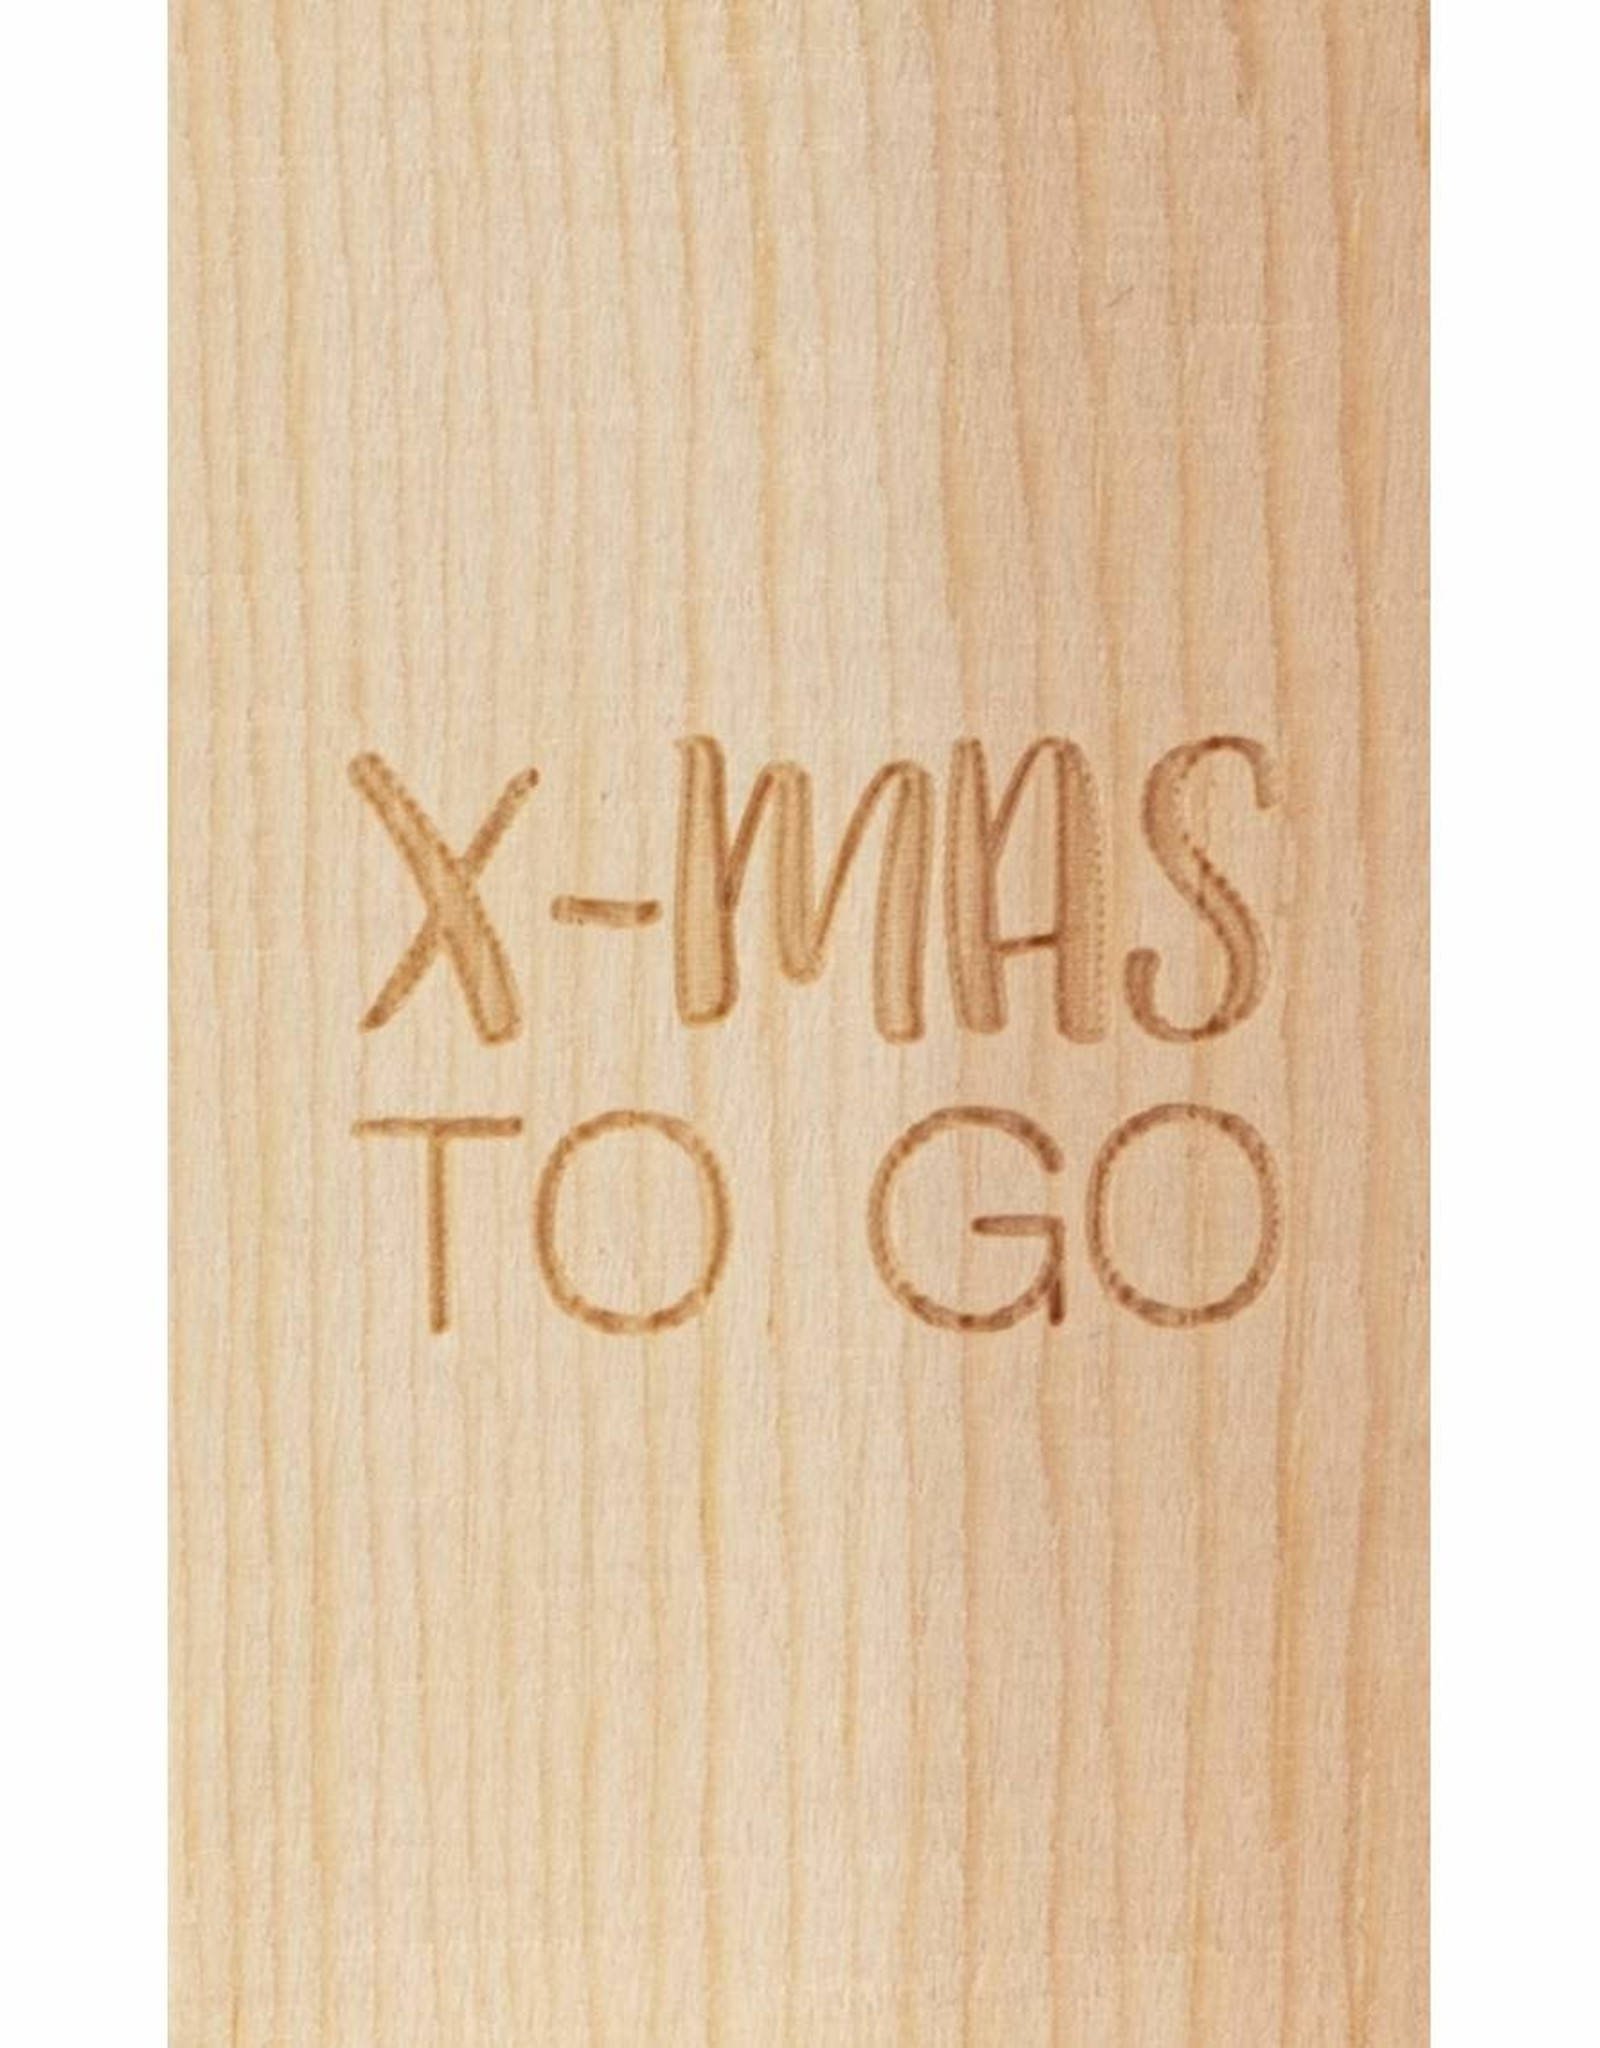 Rader Lucky box- Xmas to go fir Tree